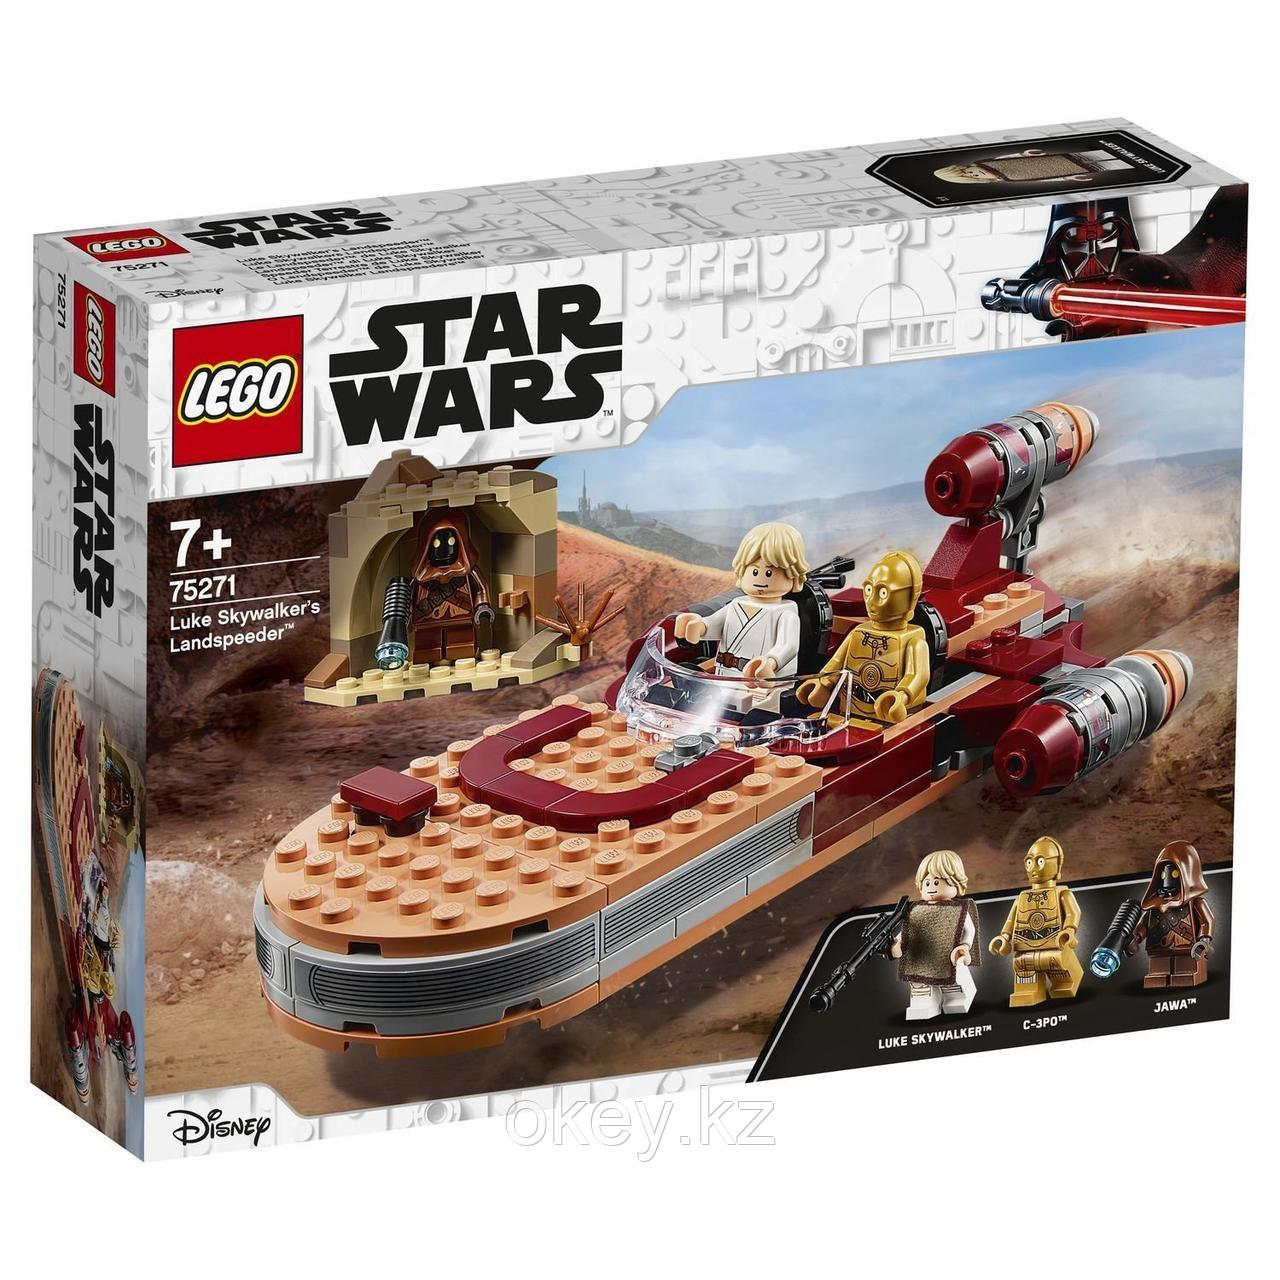 LEGO Star Wars: Спидер Люка Сайуокера 75271